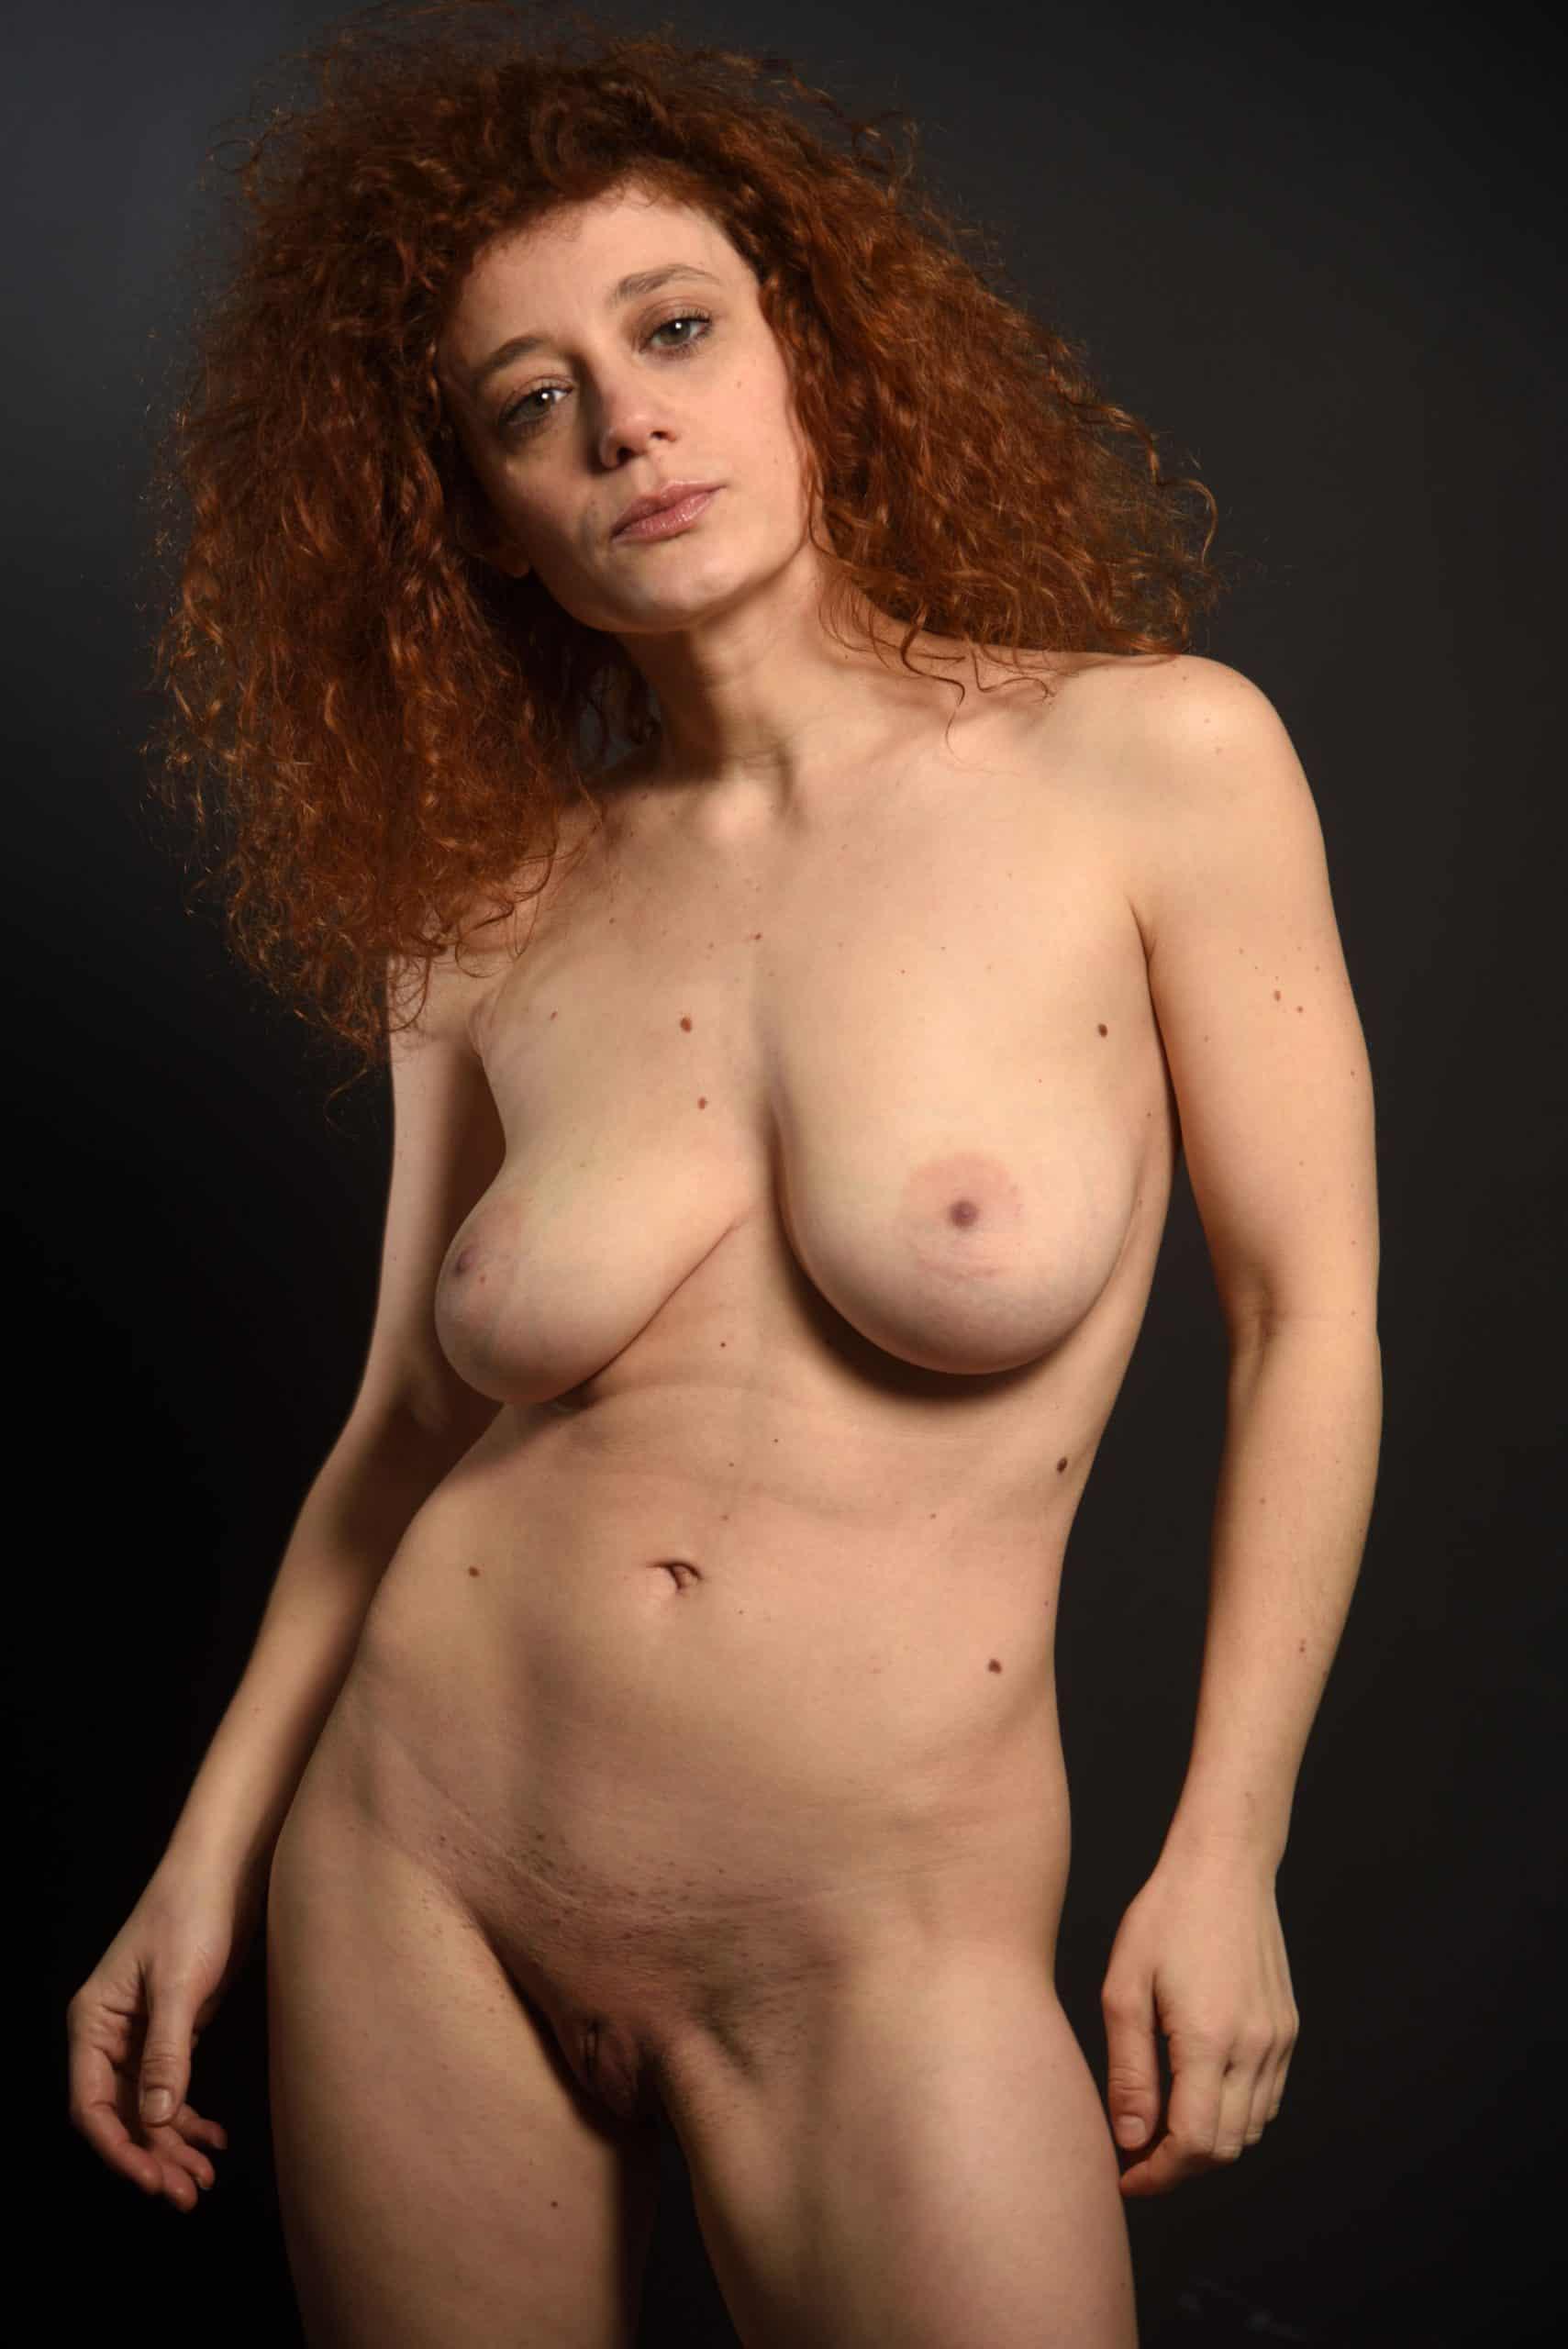 busty woman